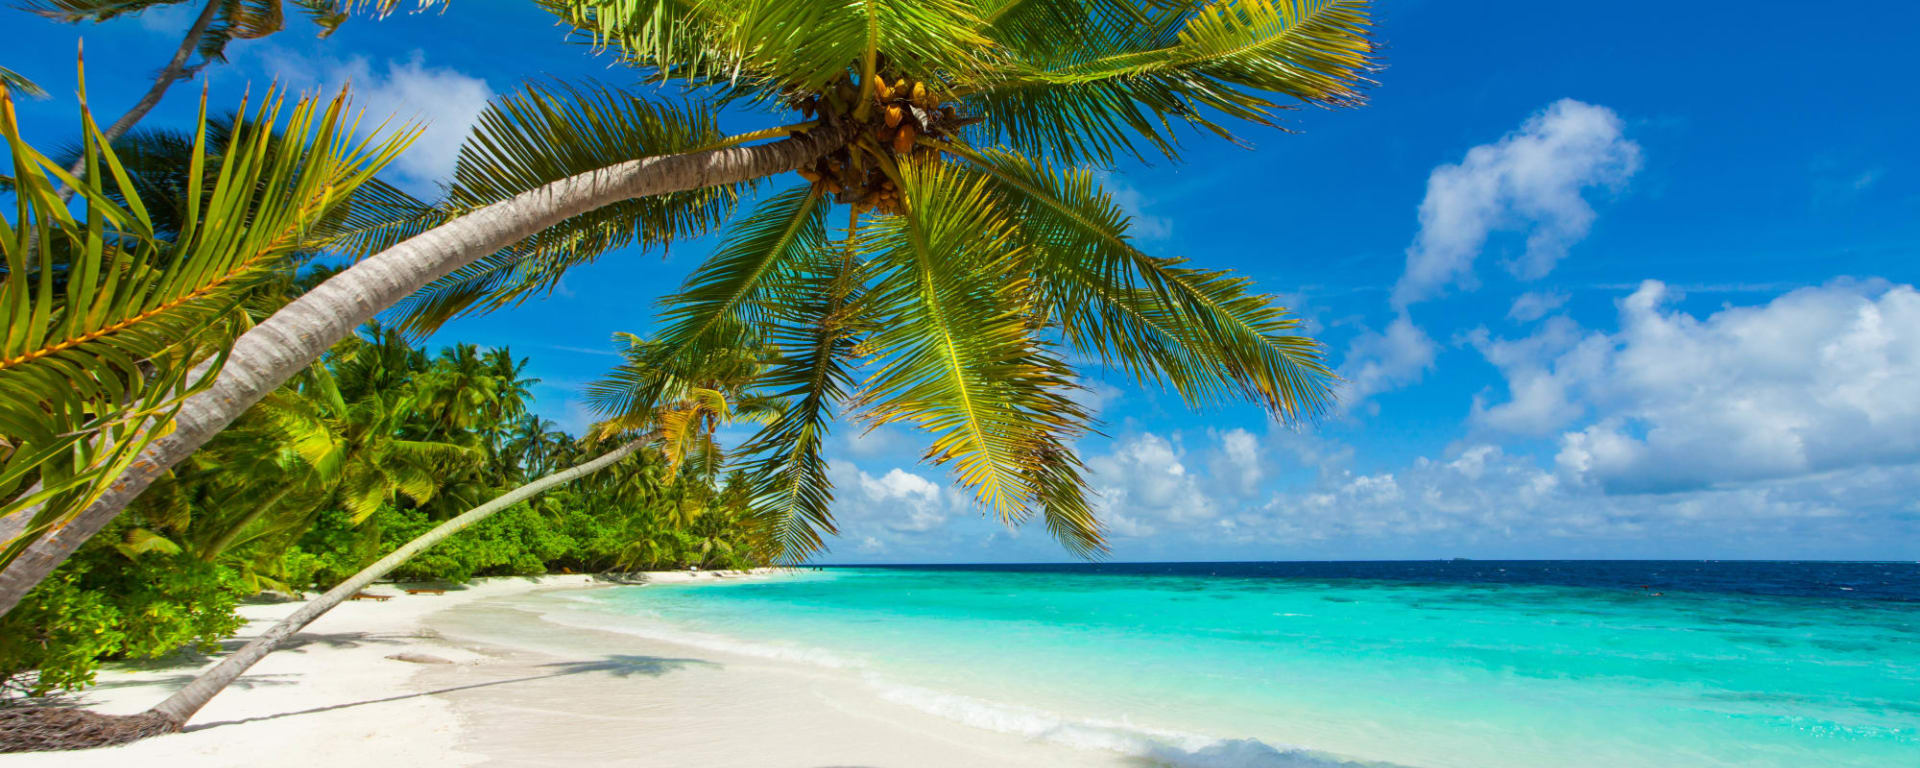 Glitzernder Perlen- & Blumenzauber ab Malediven: Malediven Traumstrand